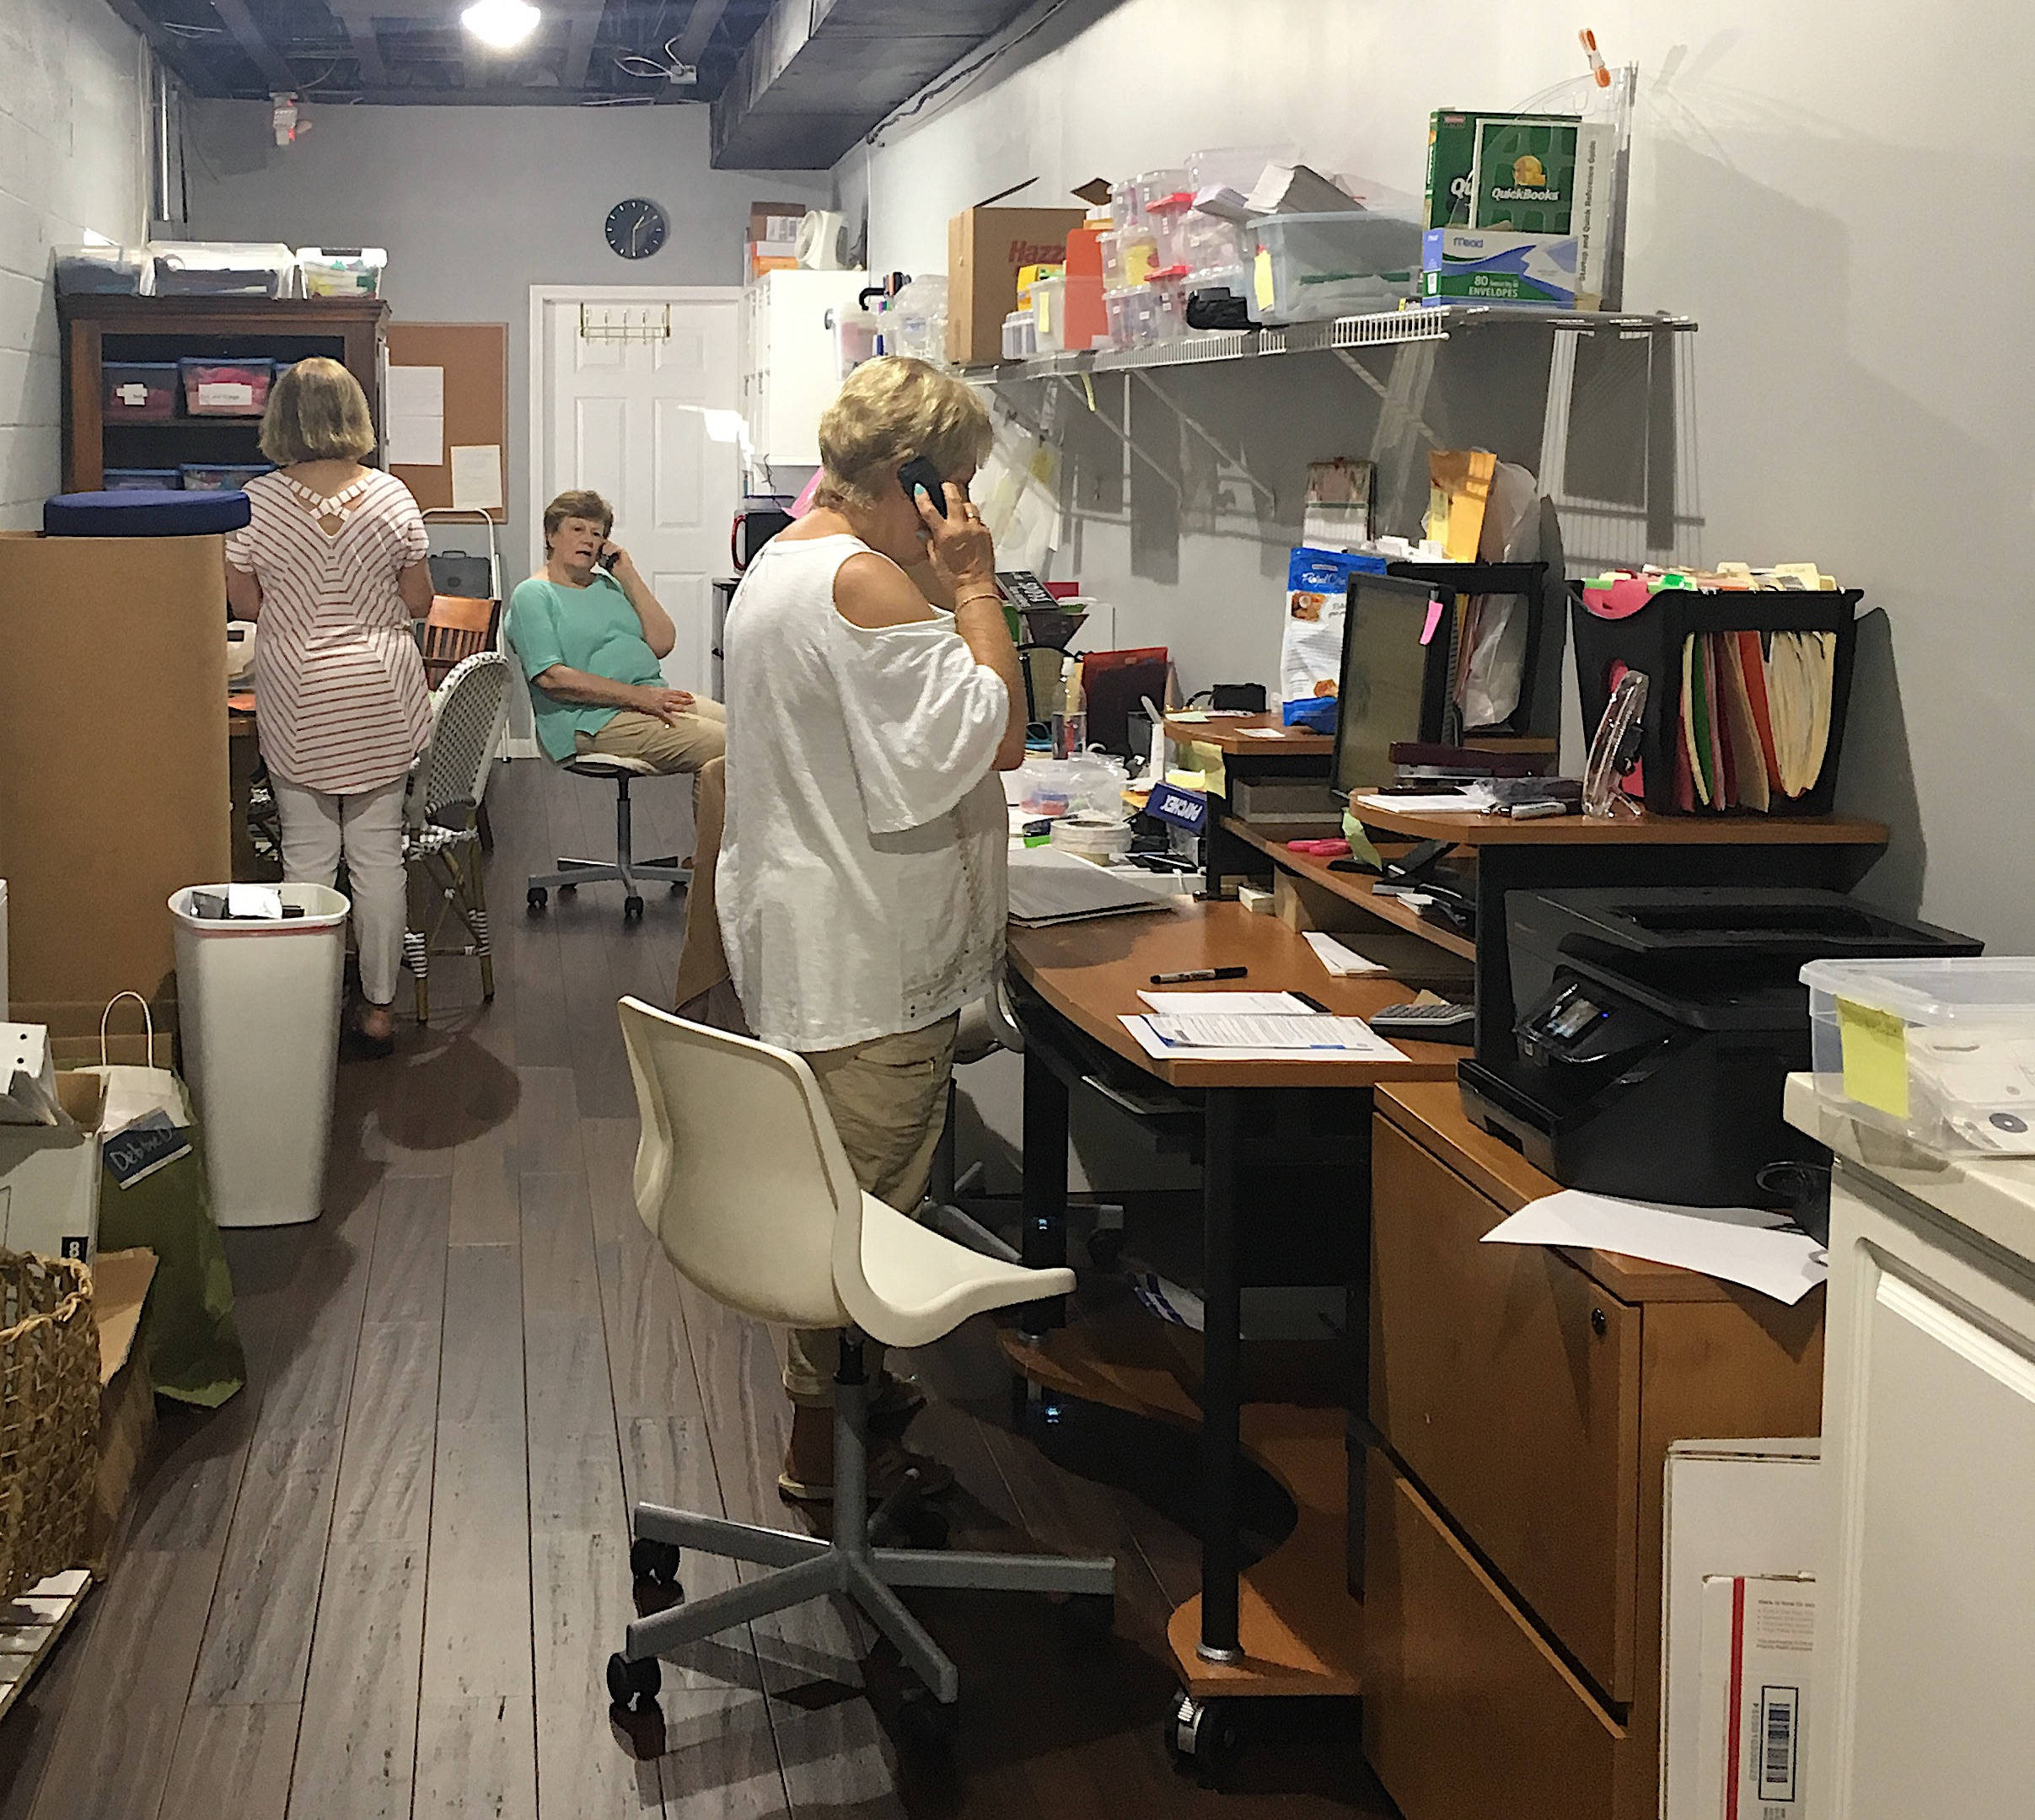 atwork in theback.JPG